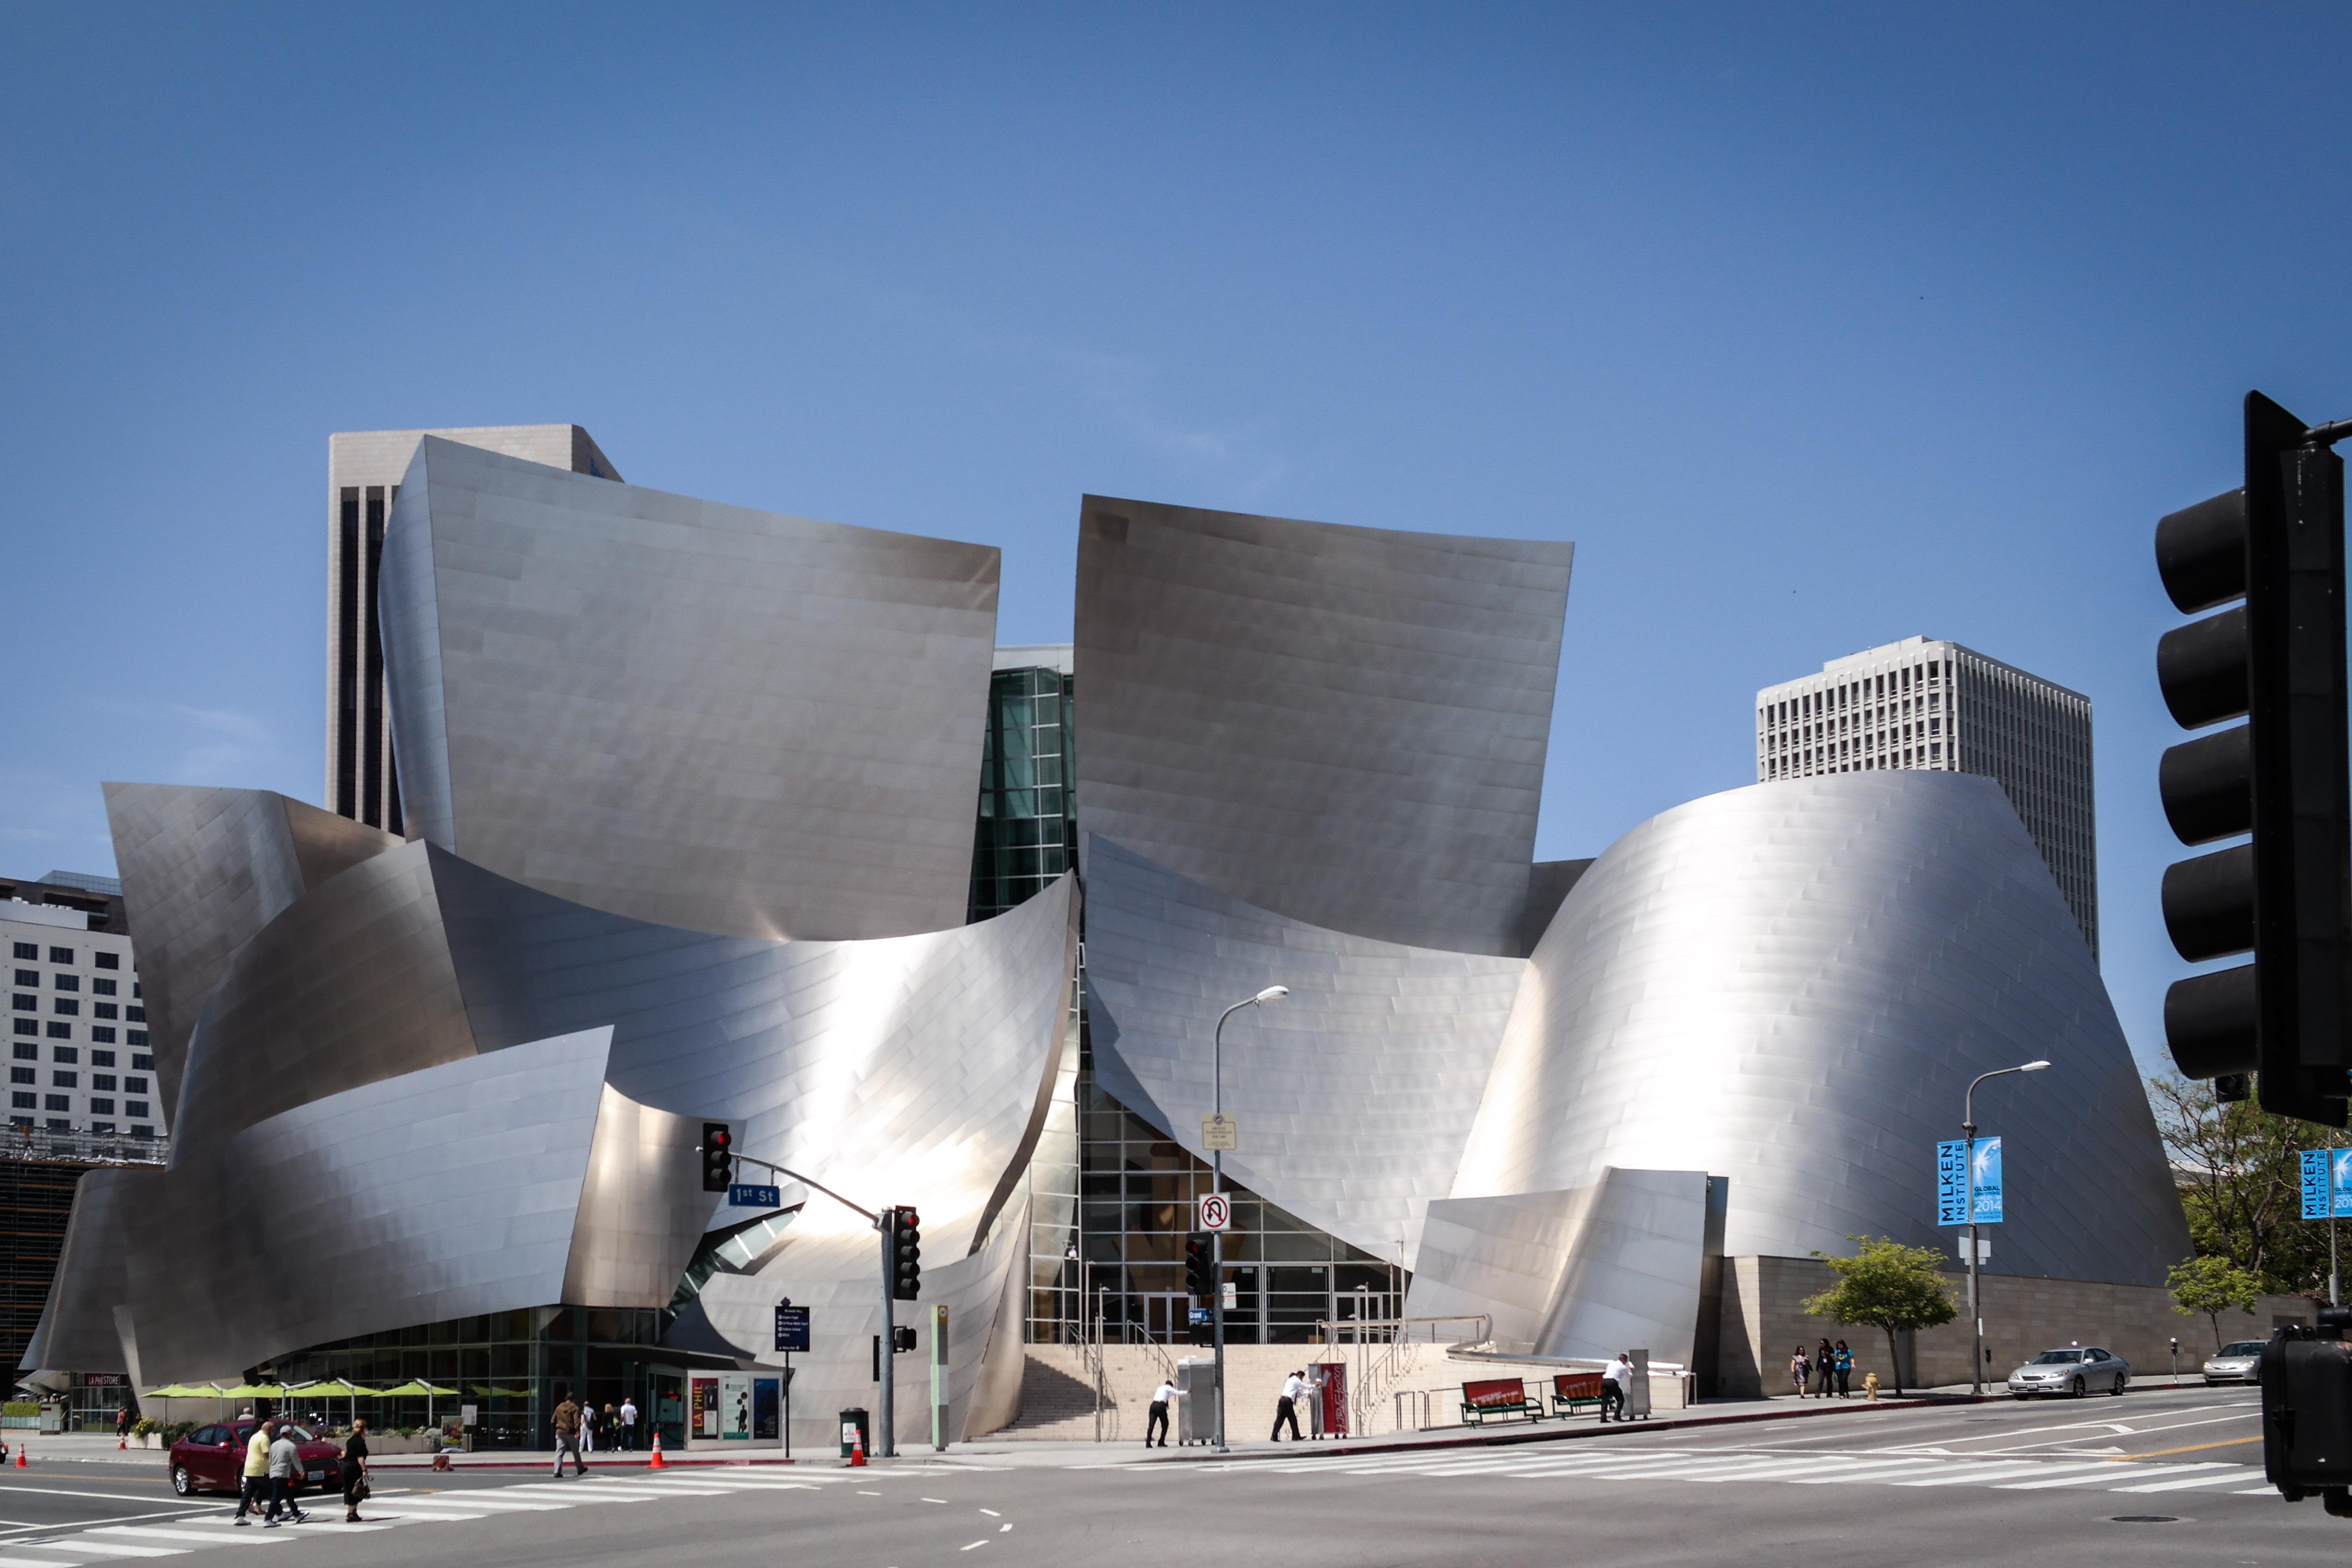 the Walt Disney Concert Hall in Los Angeles CA